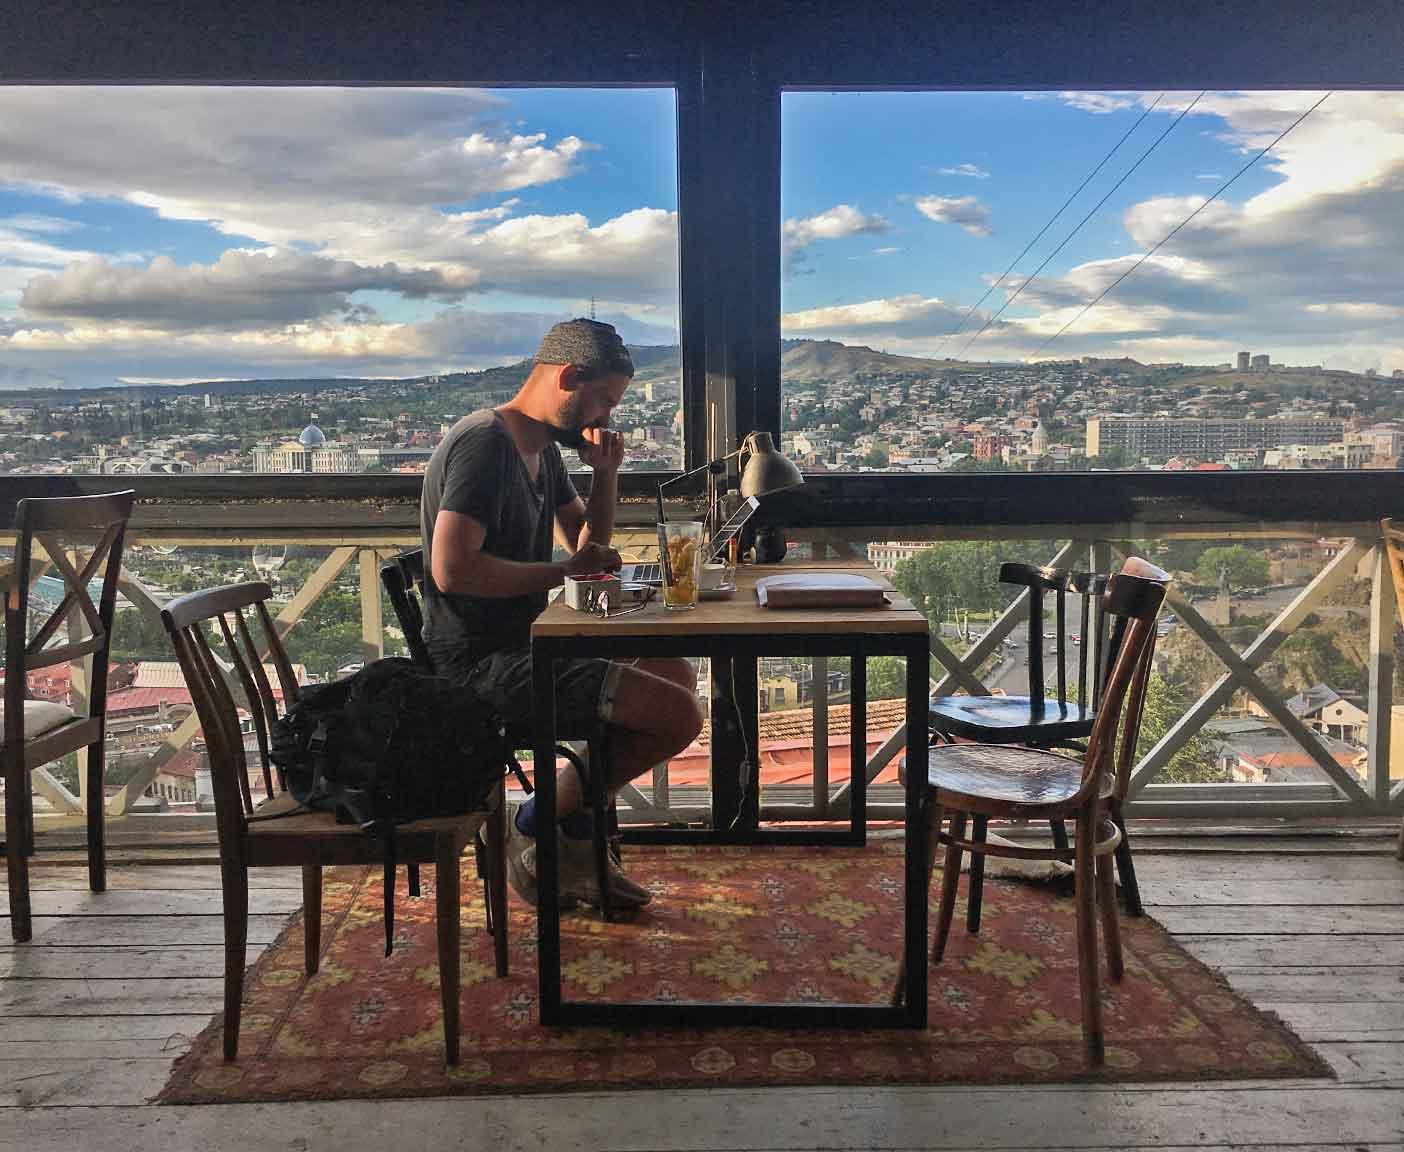 georgien-wohnmobil-erfahrungsbericht-camping-urlaub-preisniveau-tiflis-cafe